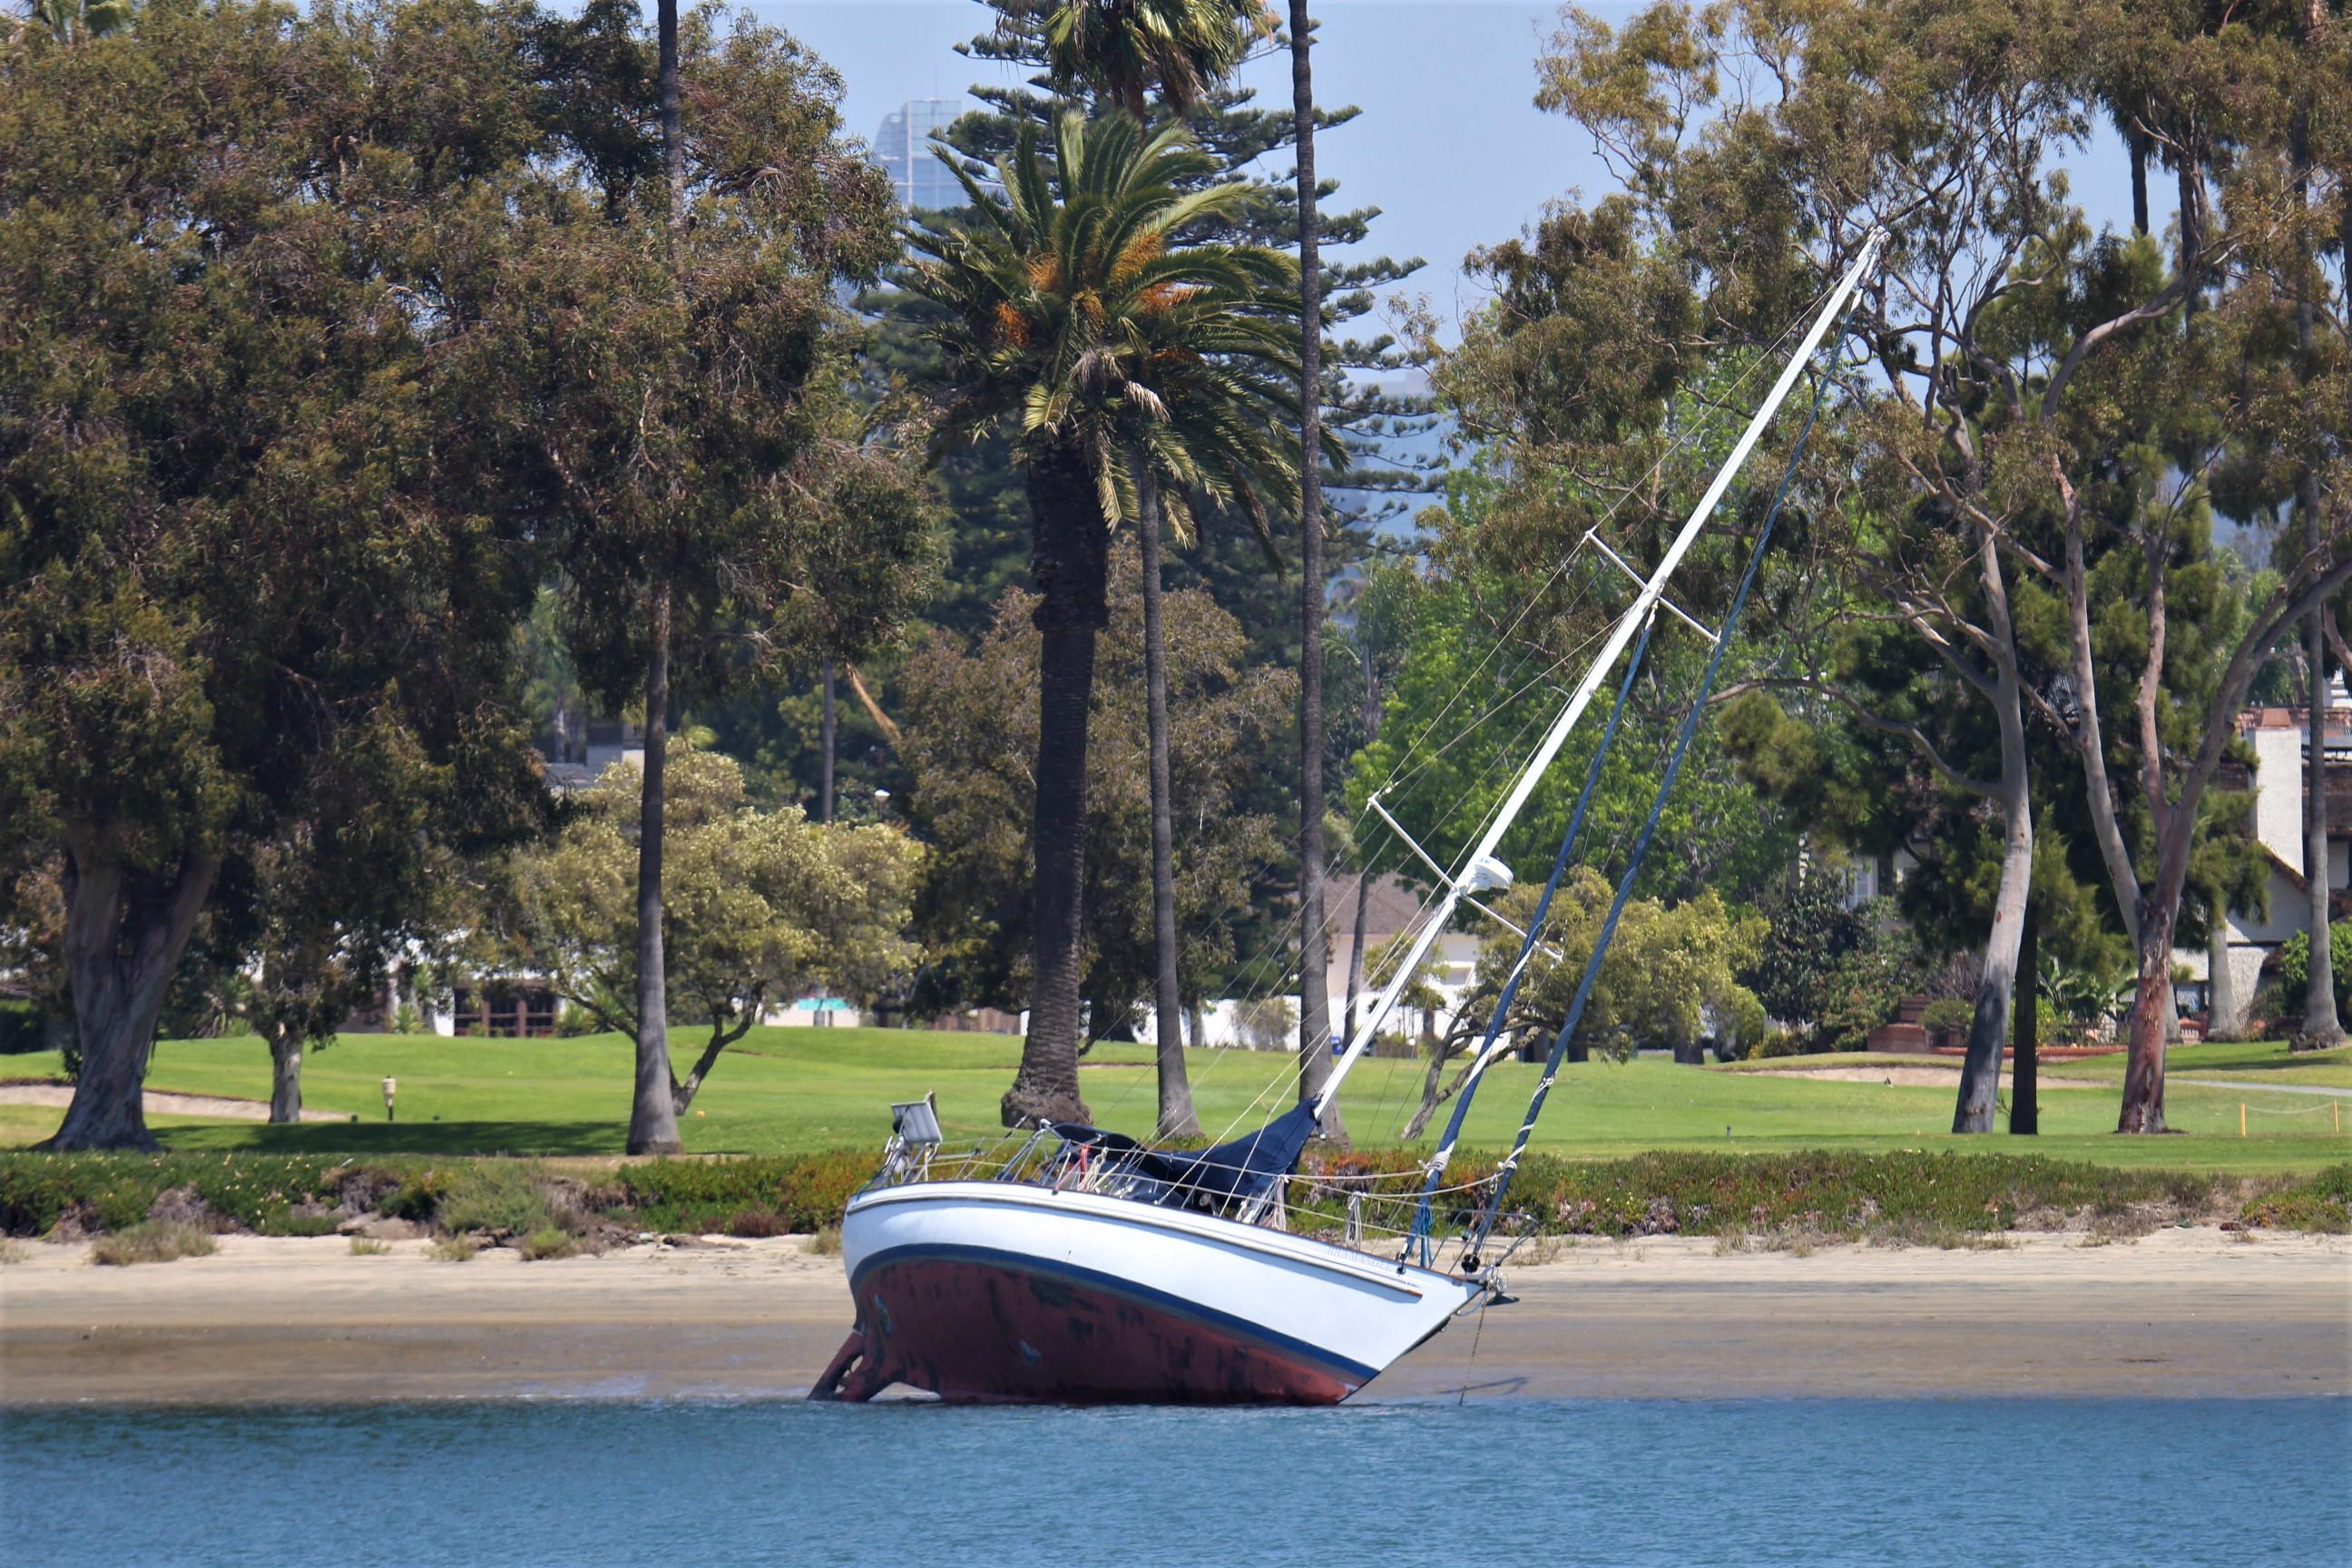 tippedboat.IMG_1717